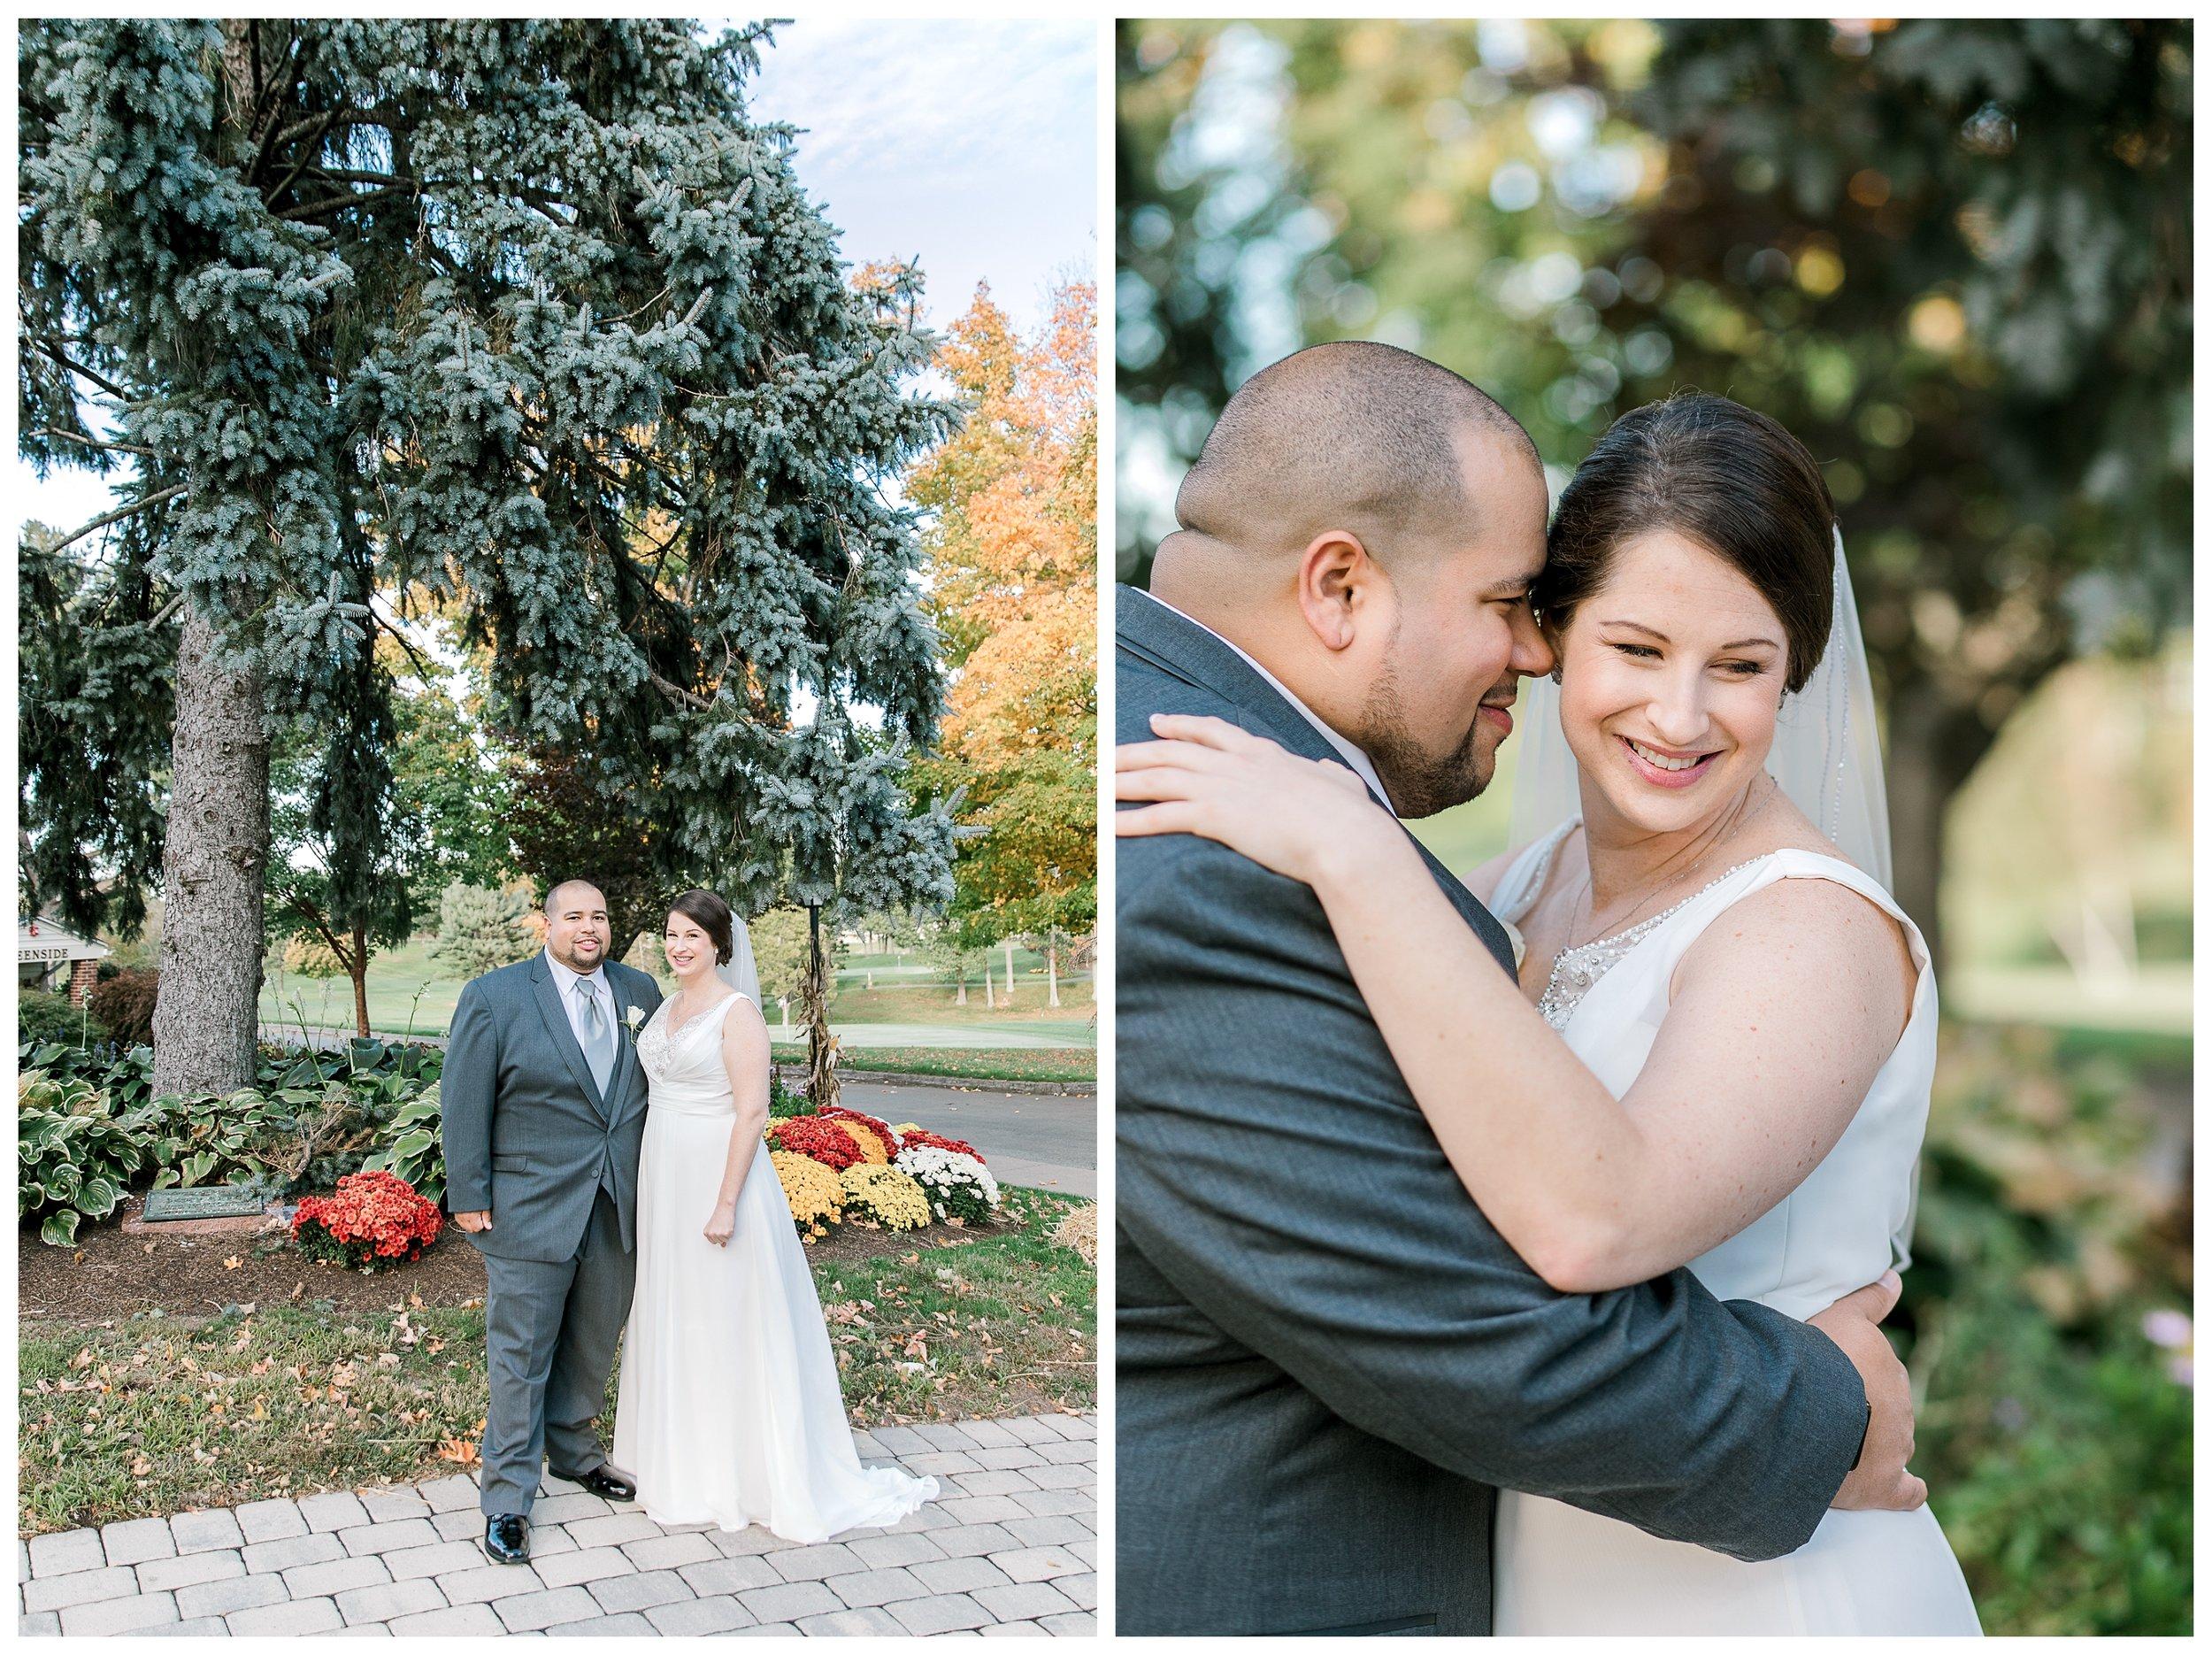 pleasant_valley_country_club_wedding_sutton_erica_pezente_photography (24).jpg